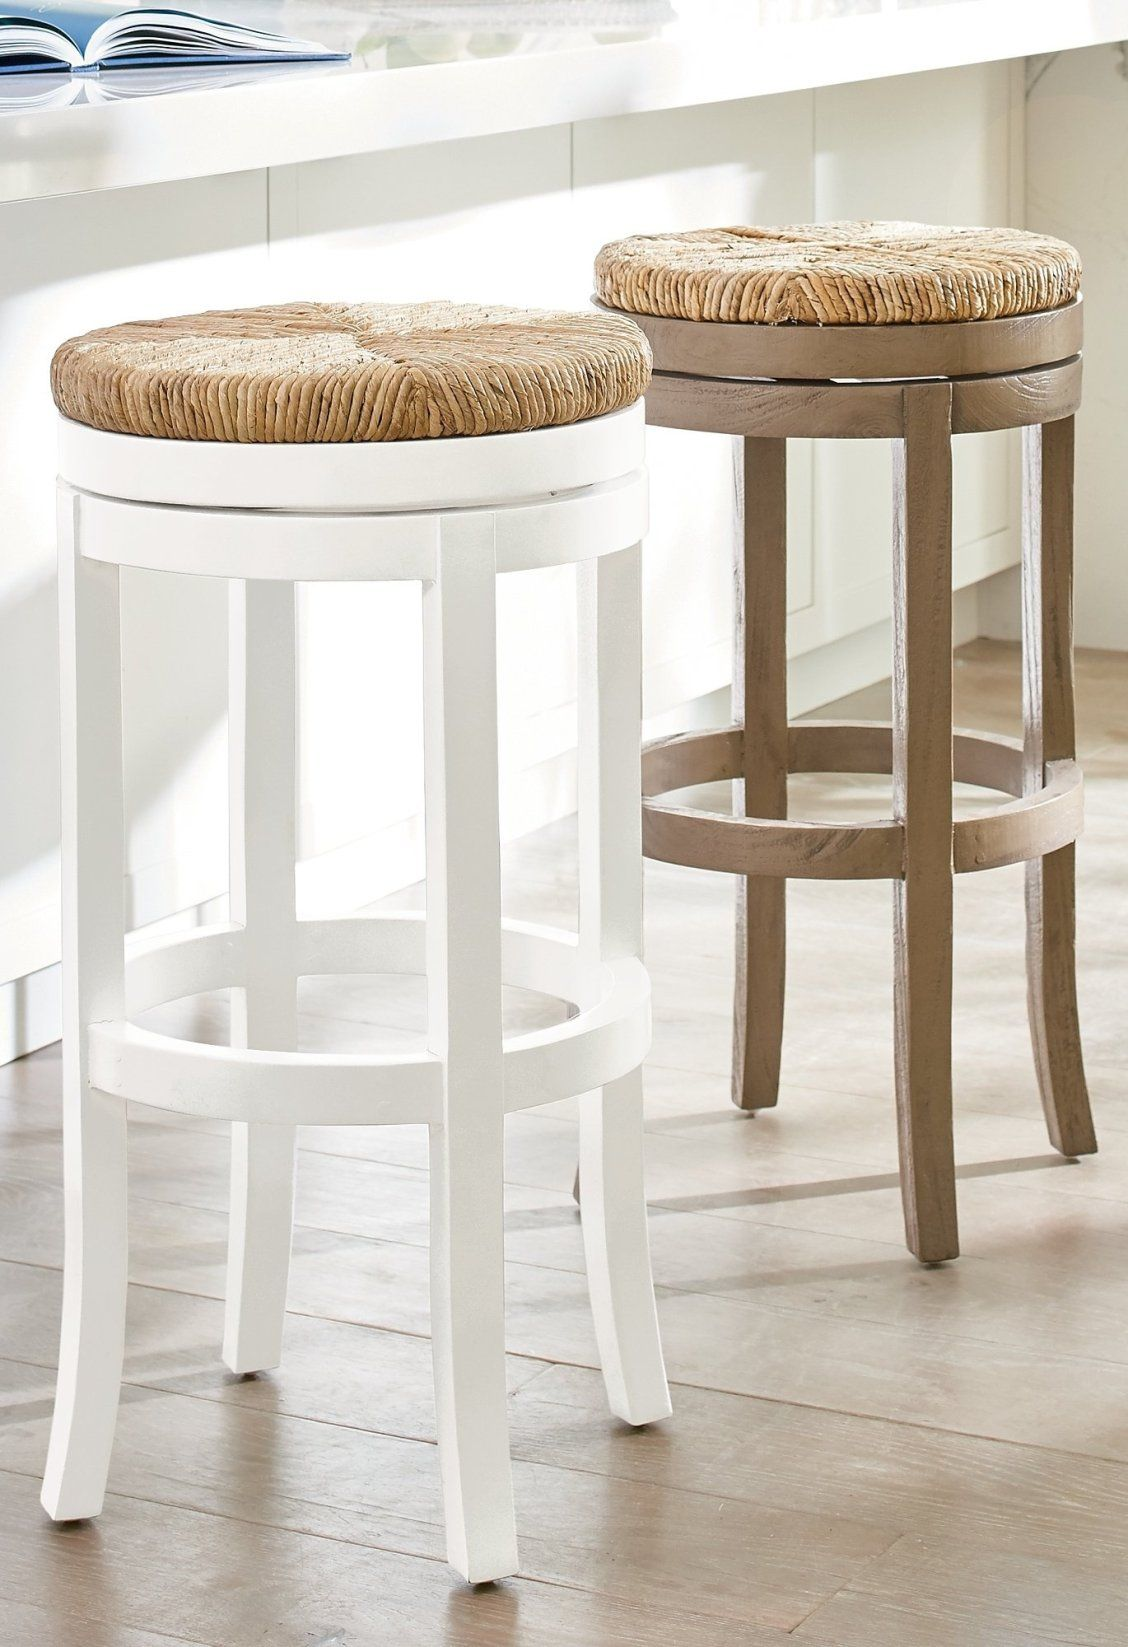 woodies kitchen bar stools> OFF 9